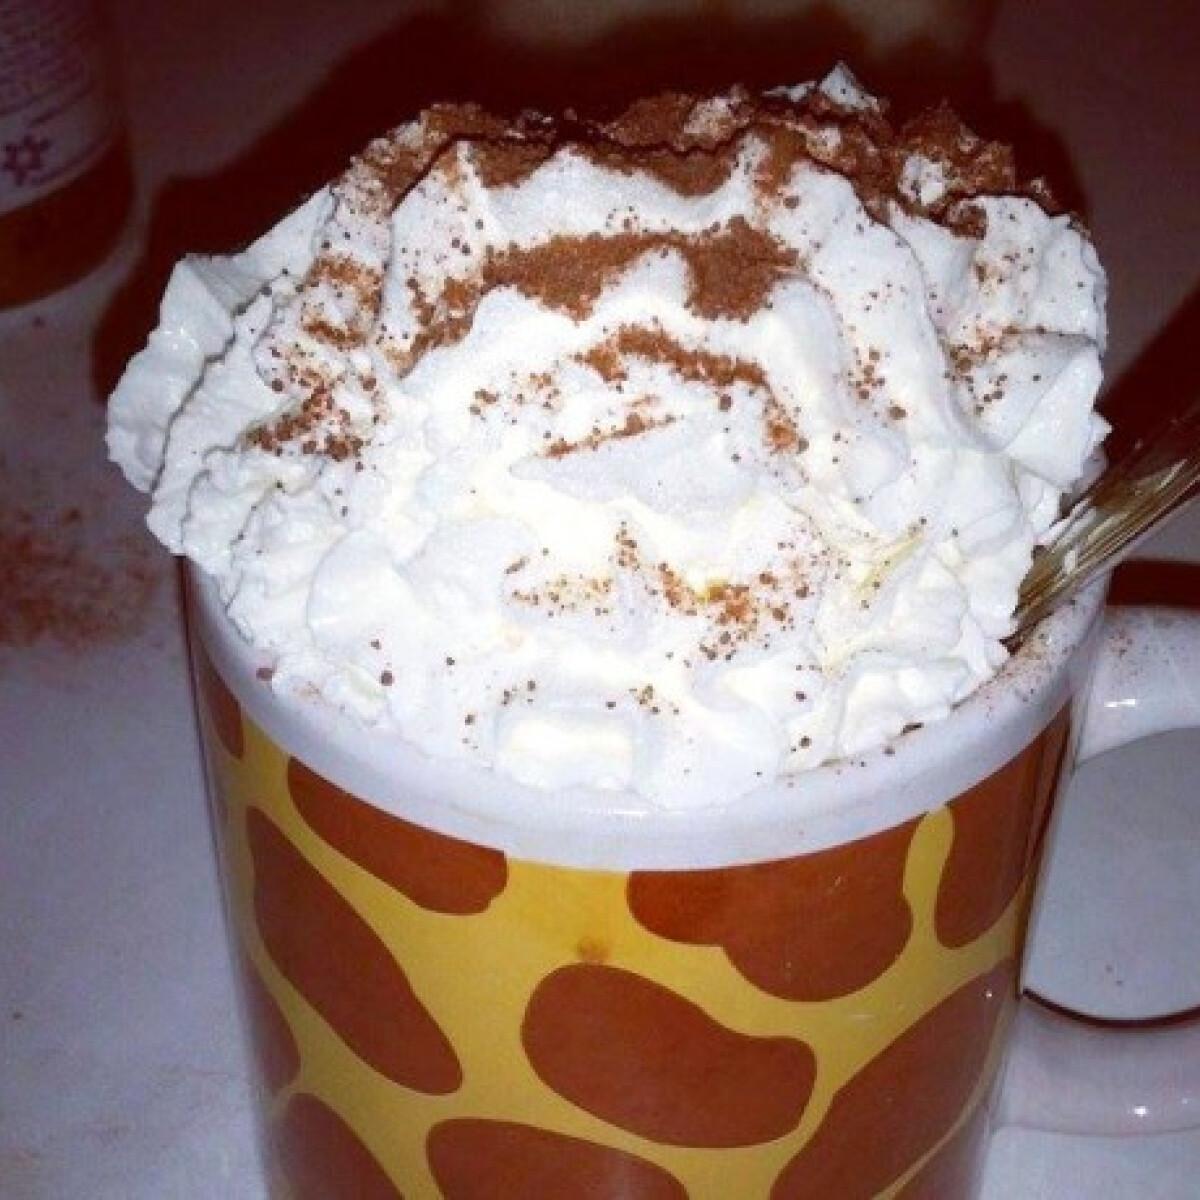 Chococcino